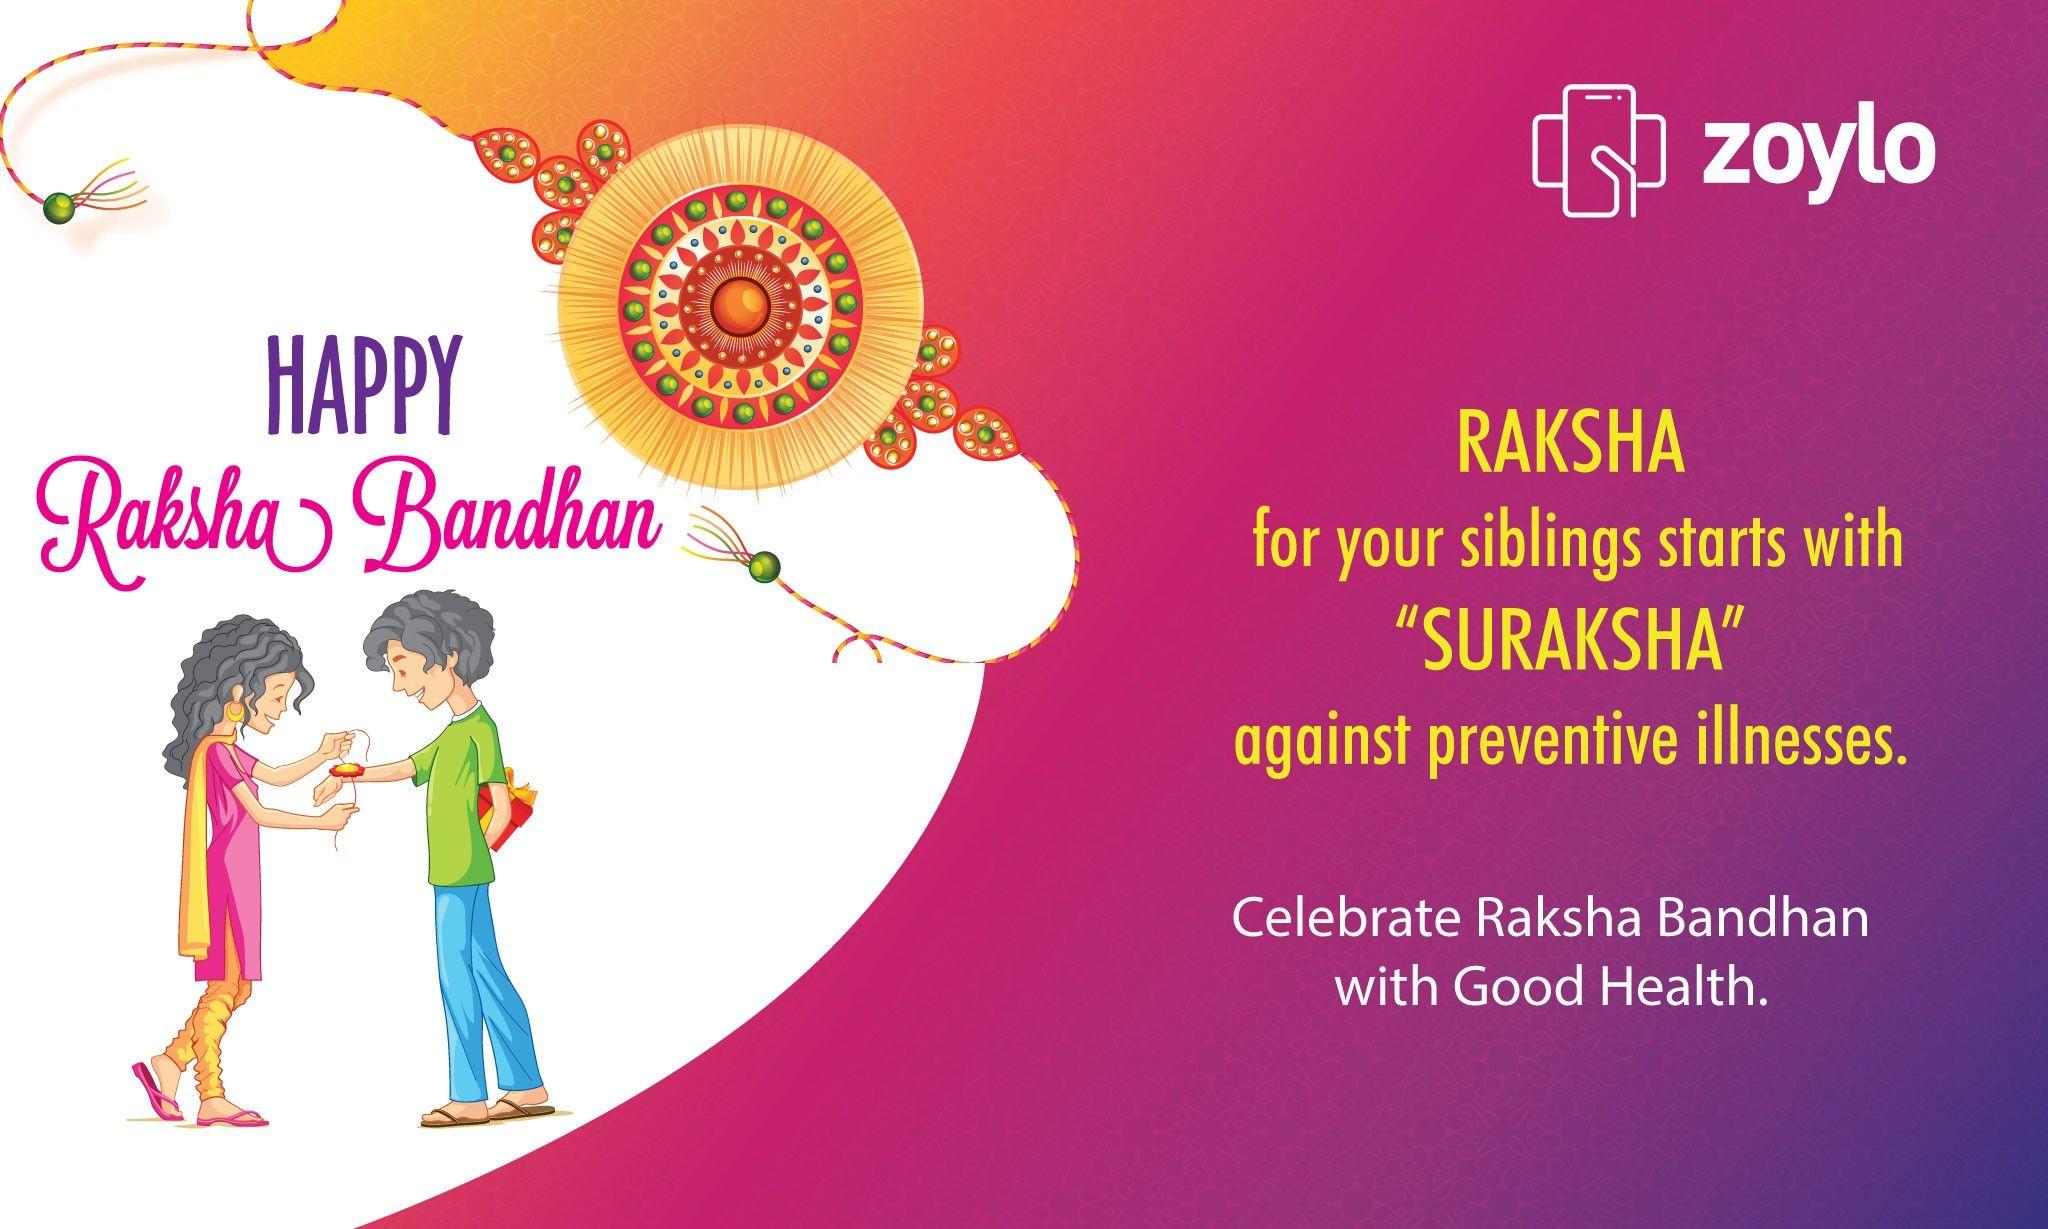 Zoylo wishes a HAPPY RAKSHA BANDHAN to all and encourage